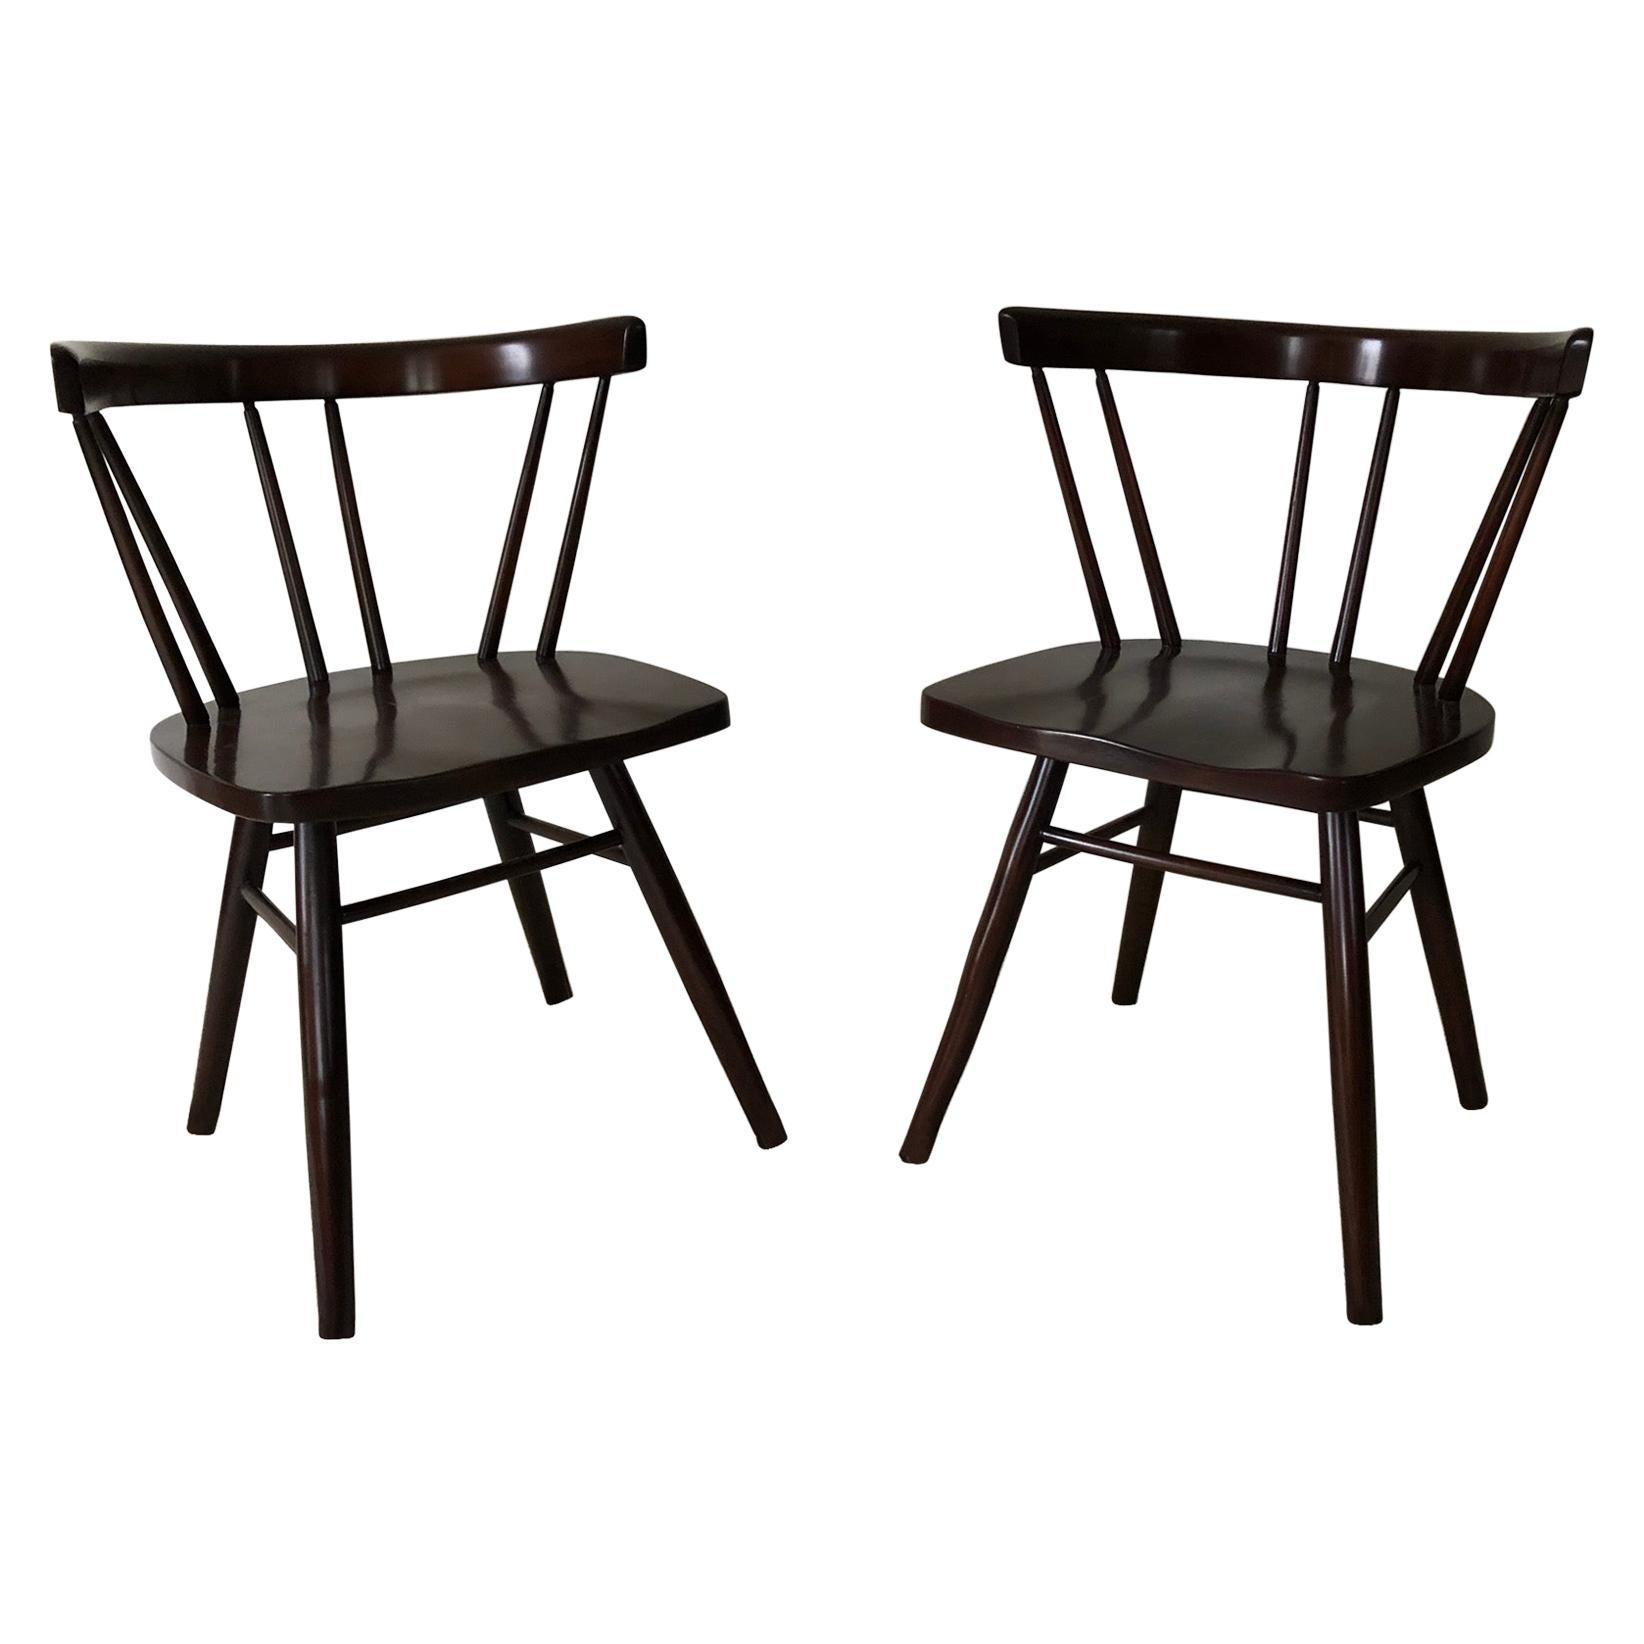 Pair of Walnut Nakashima Style Midcentury Chairs